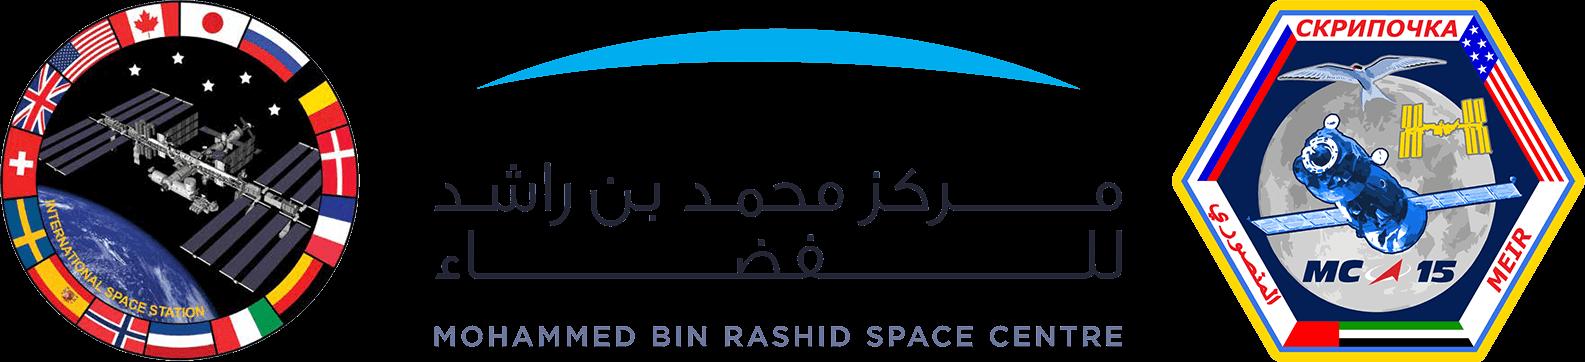 UAE first astronaut Soyuz launch Hazza Ali Abdan Khalfan Al Mansouri